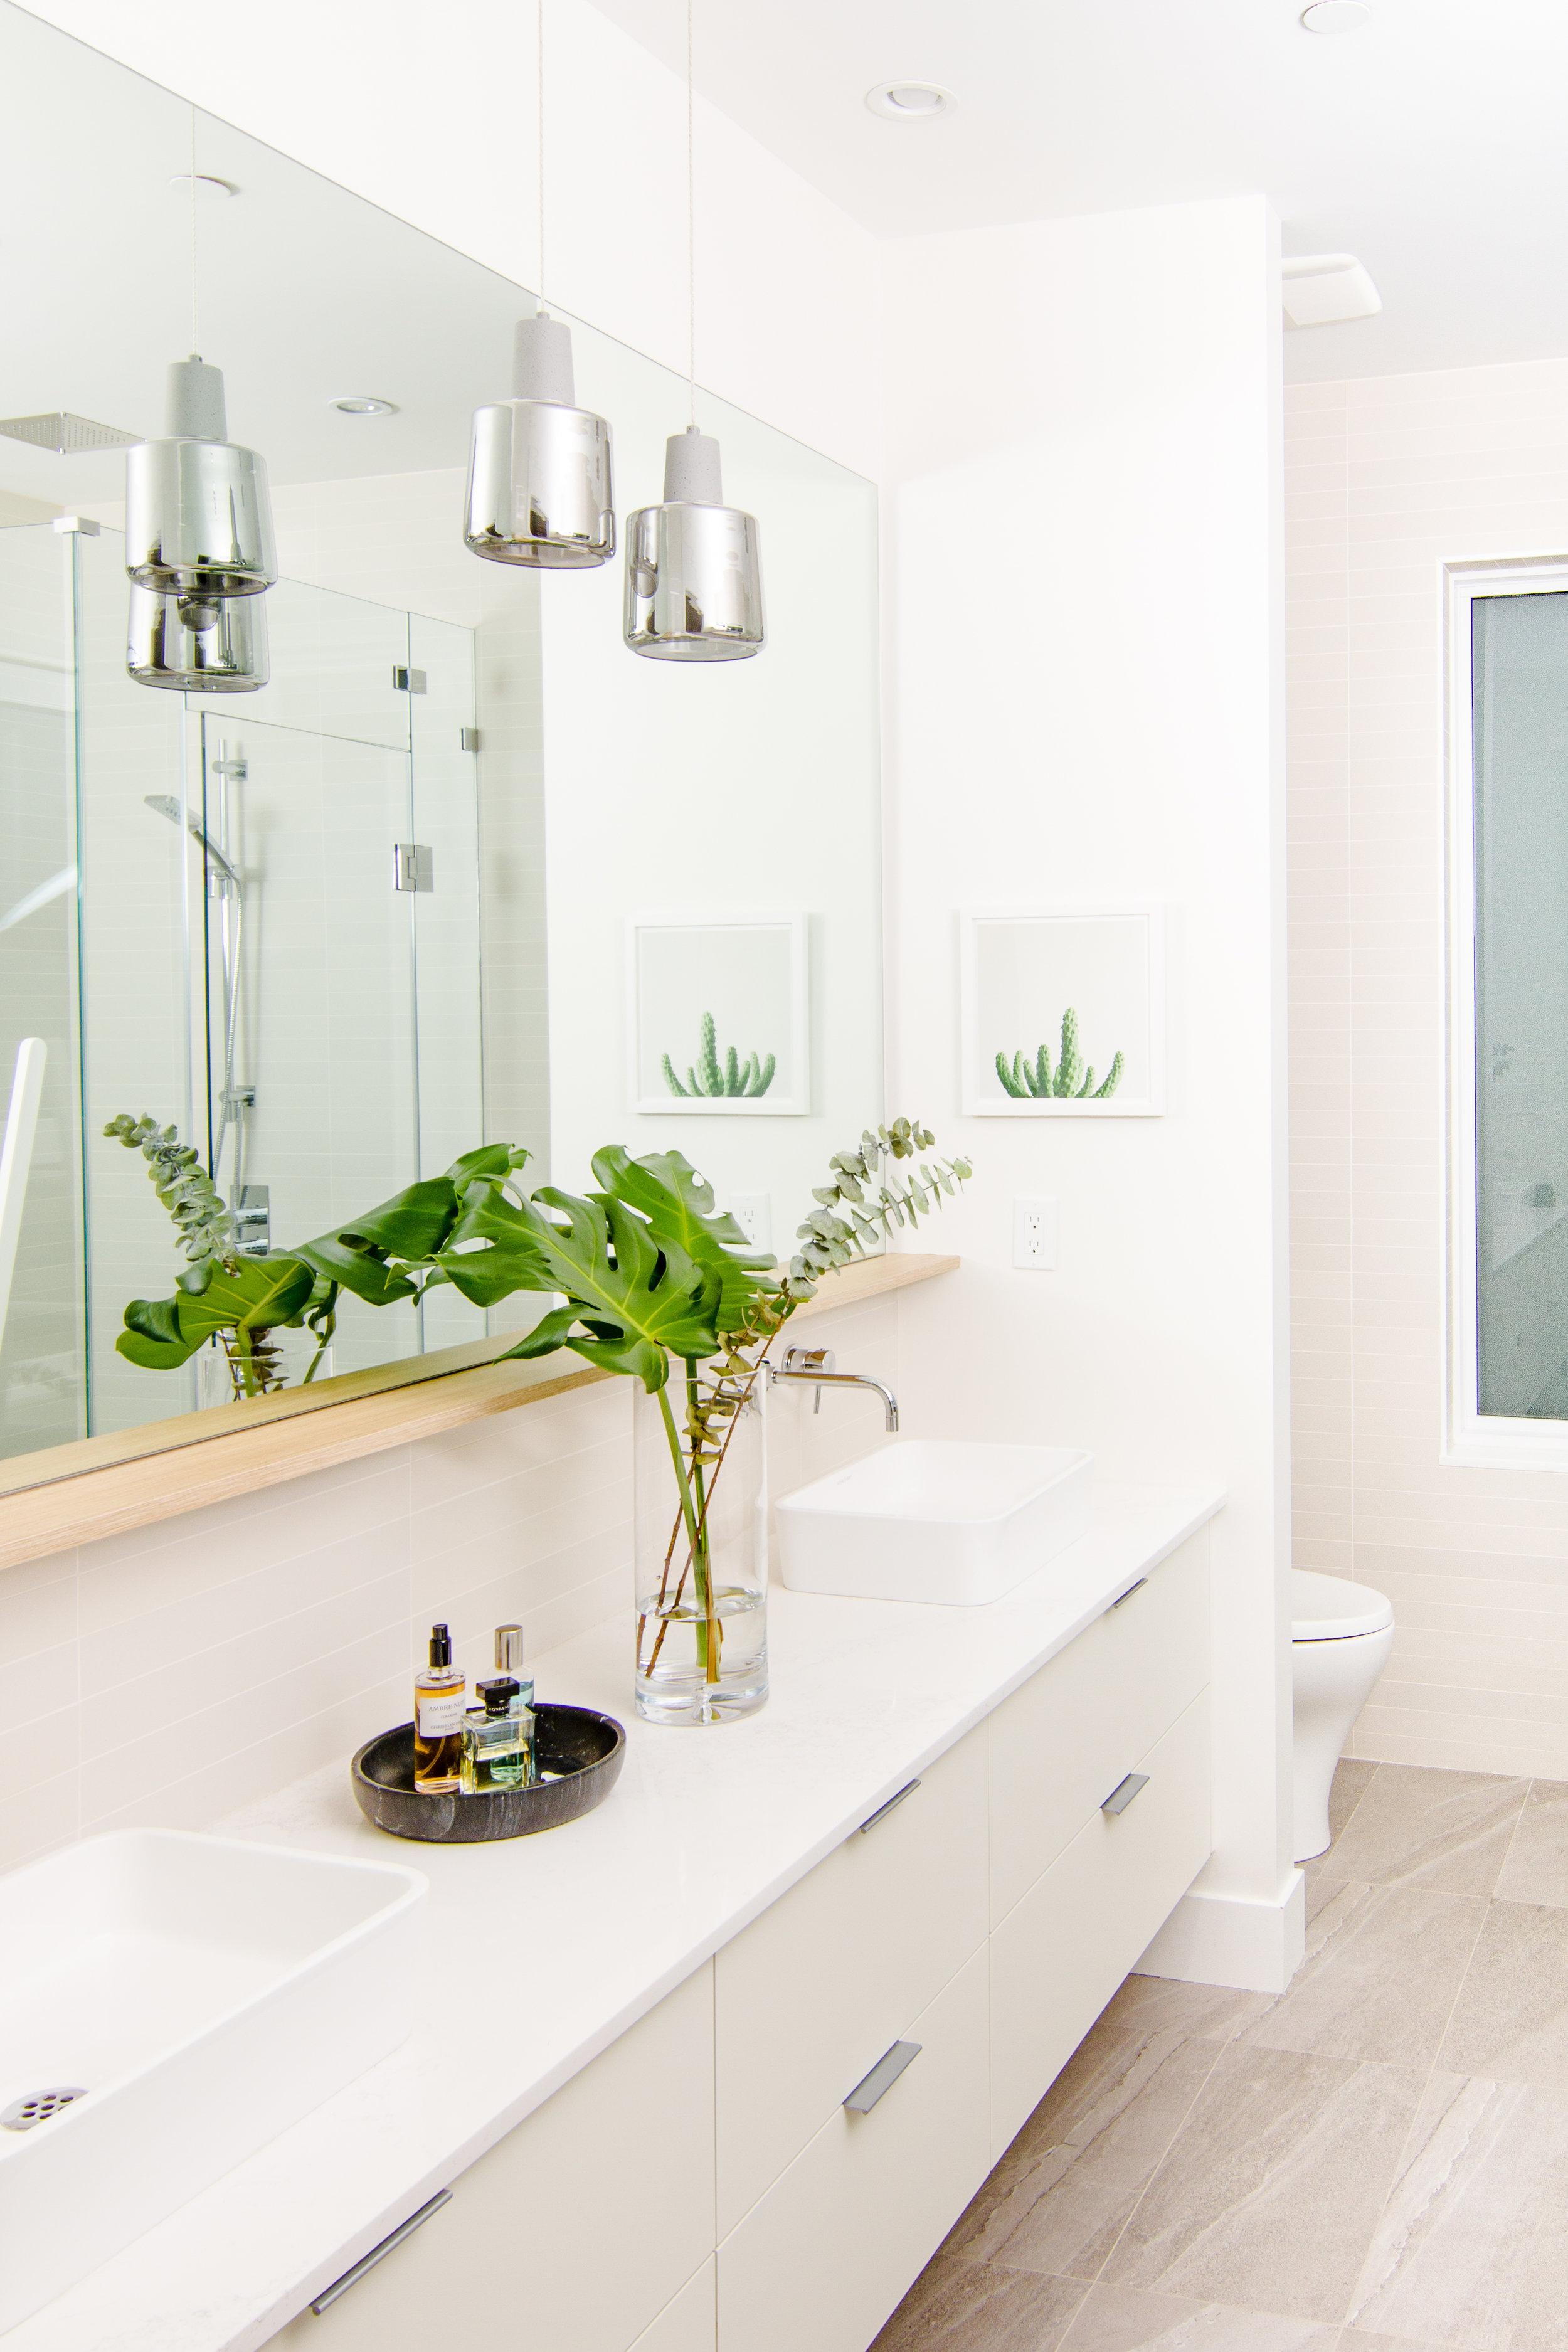 mocoro-studio-interior-design-architecture-home-styling-koo10.jpg